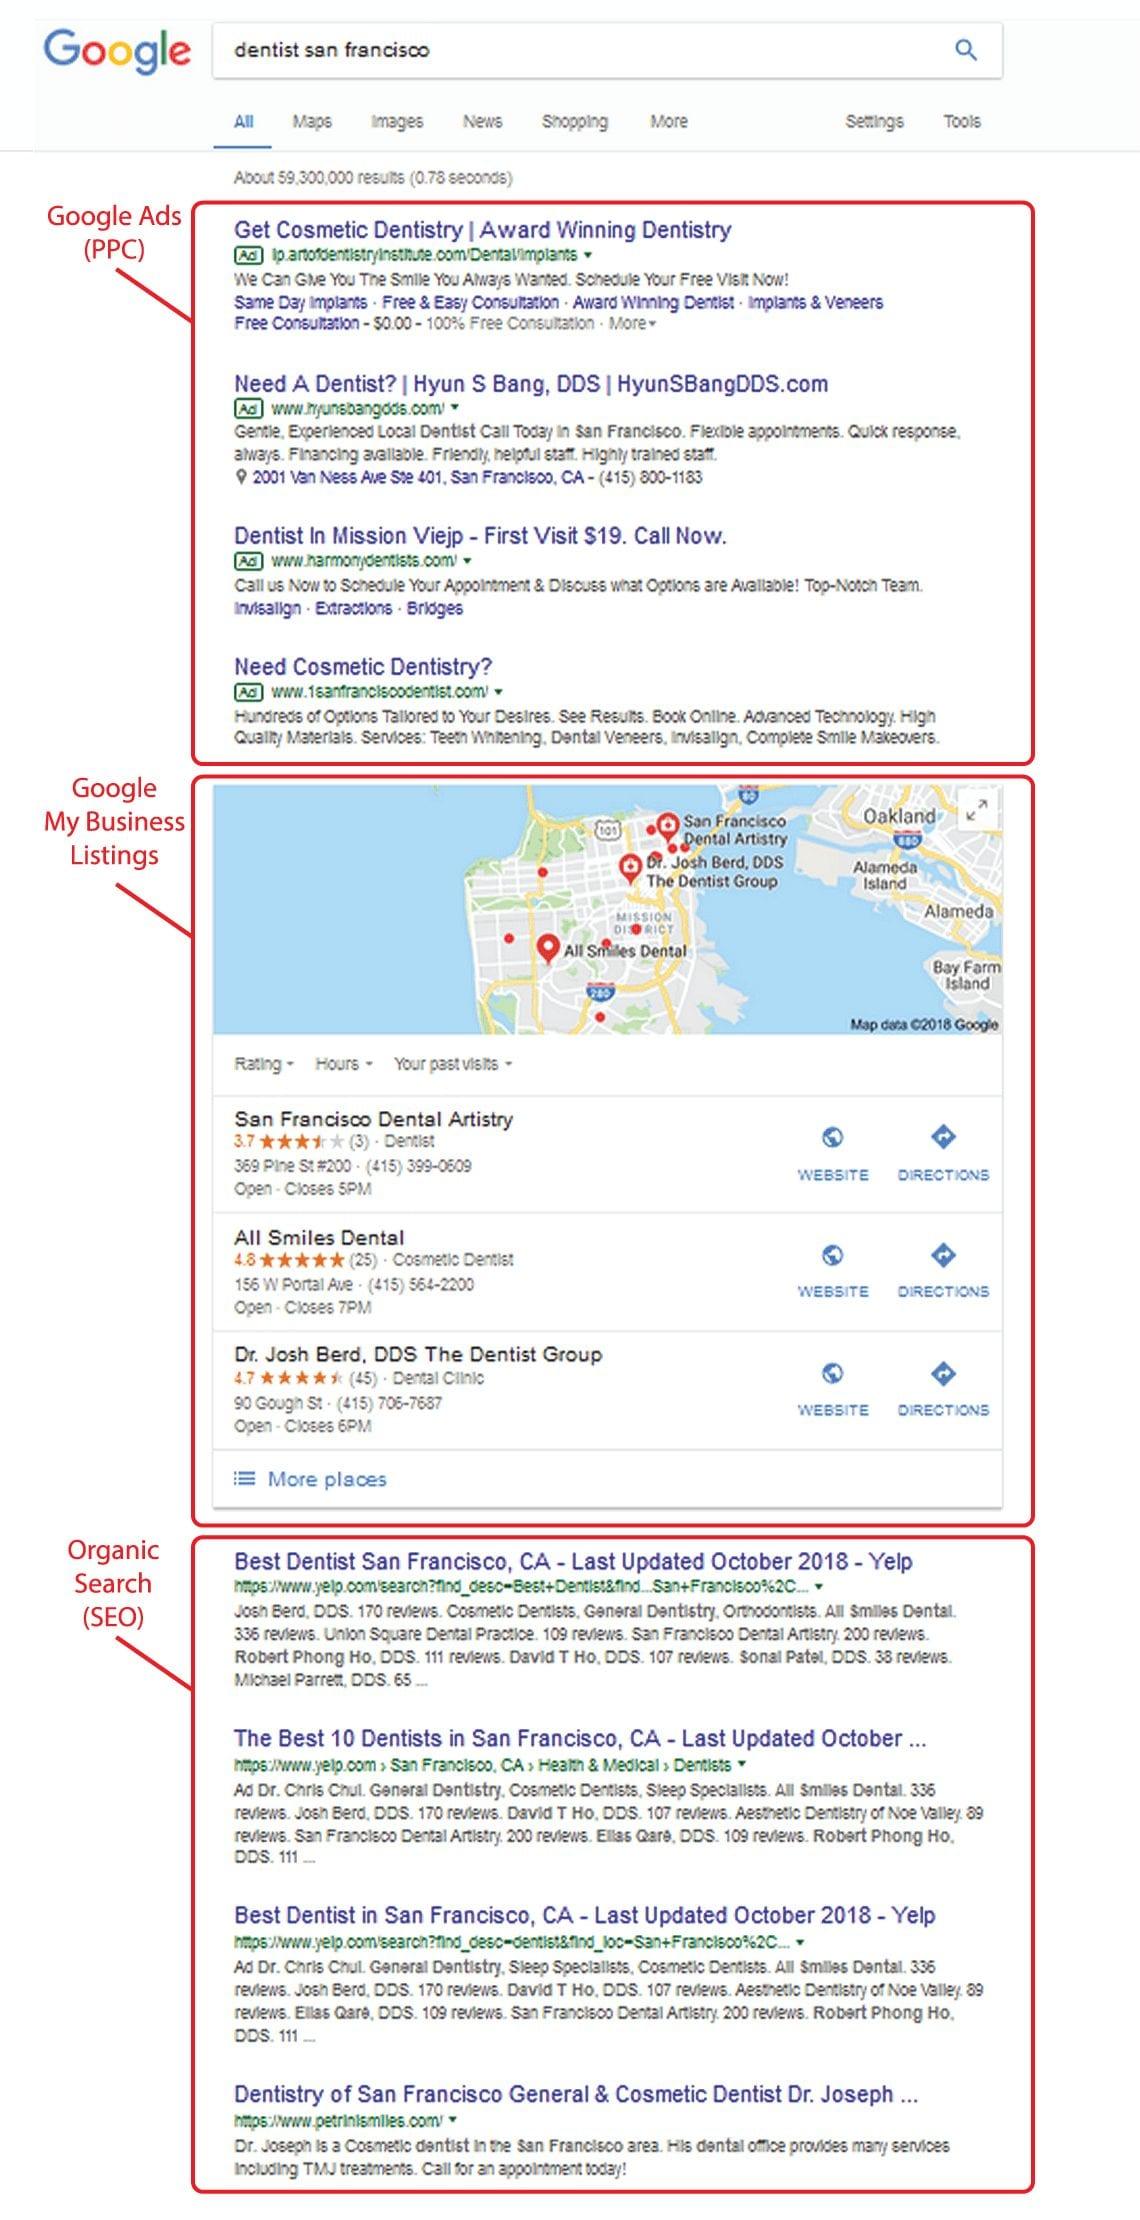 Google-SERP-Layout.